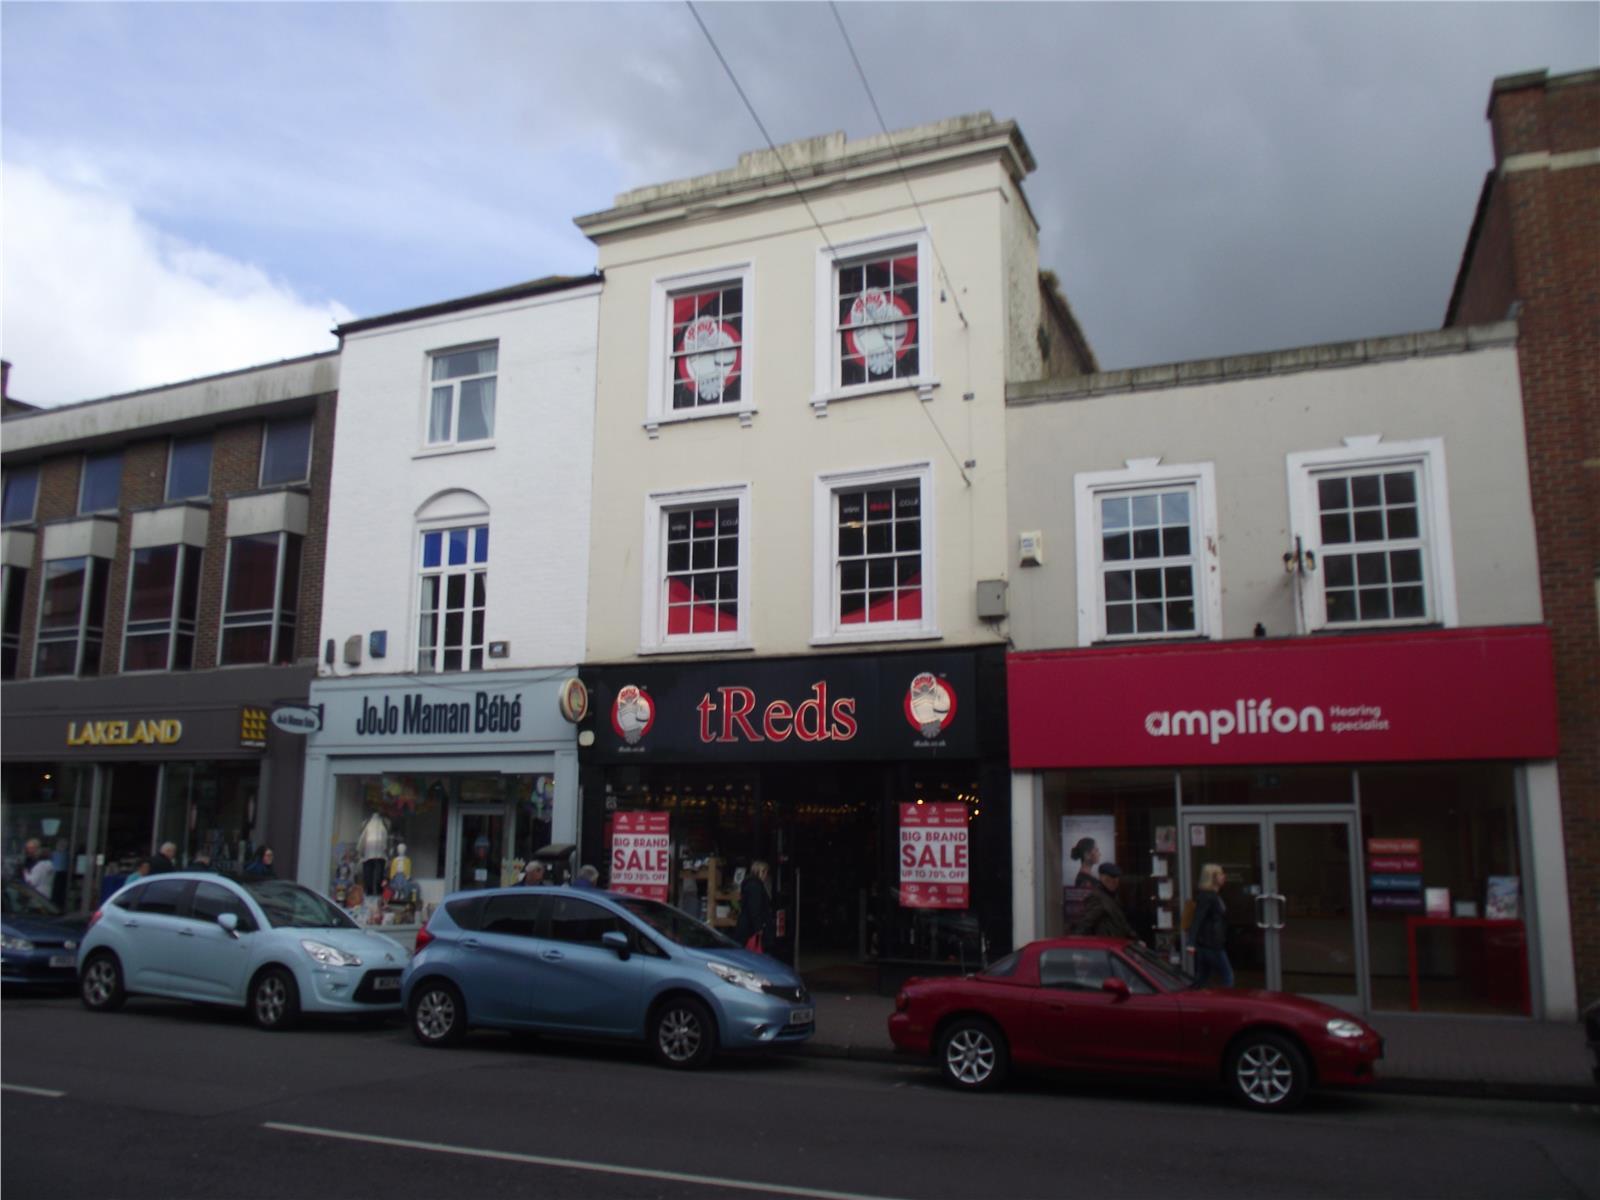 17 East Street, Taunton, Somerset, TA1